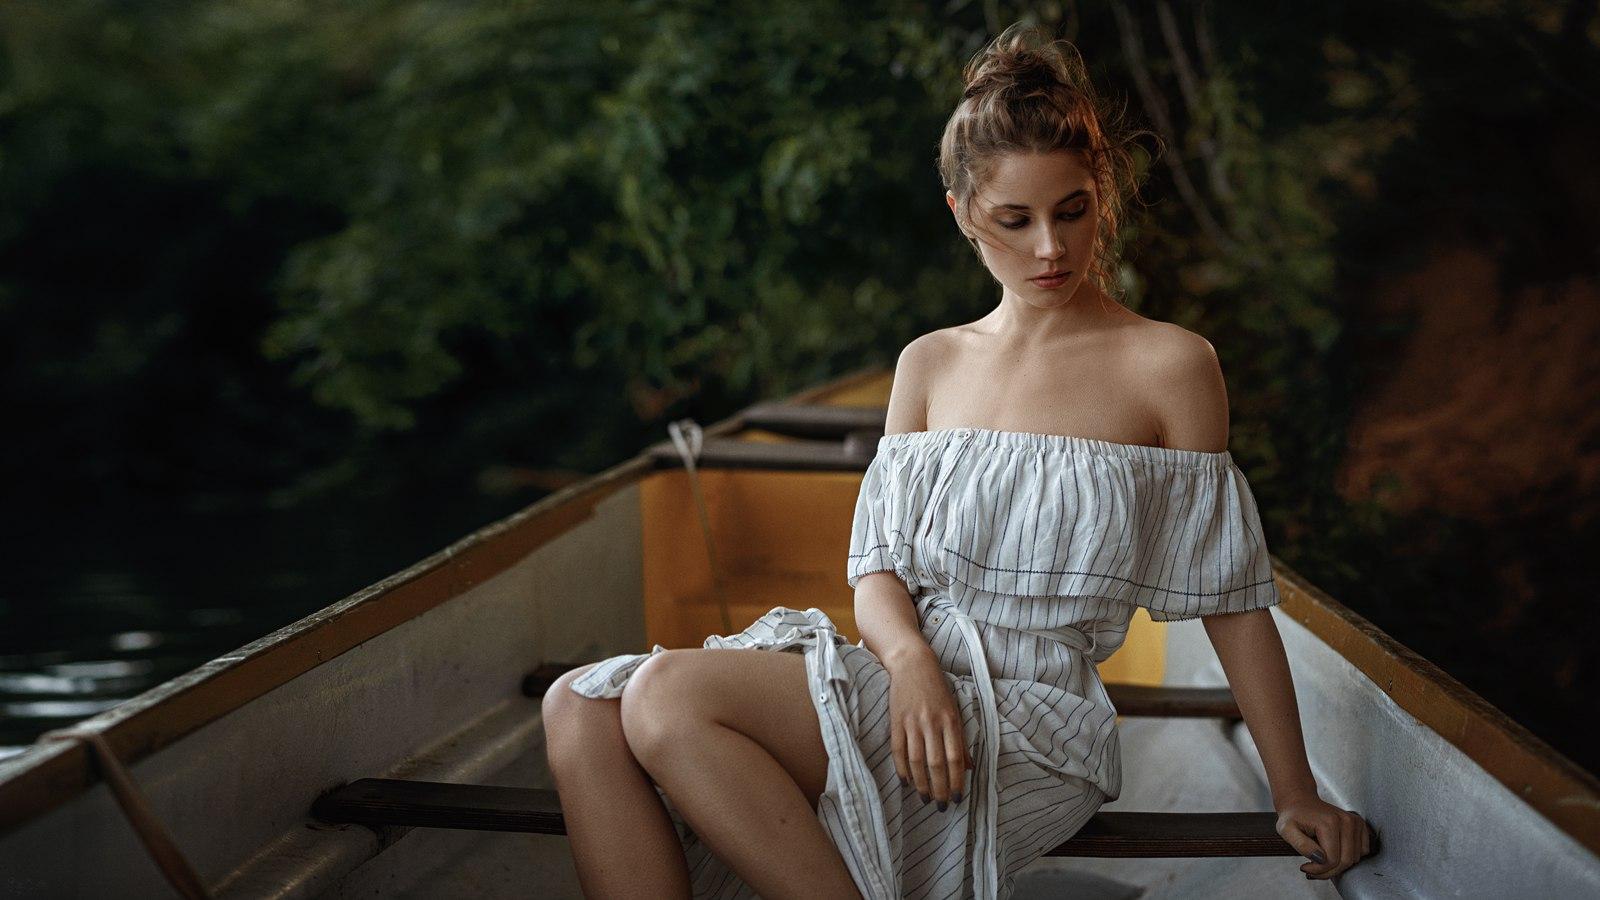 Barca Girl Wallpaper Sfondi Brunetta Donne All Aperto Barca Spalle Nude